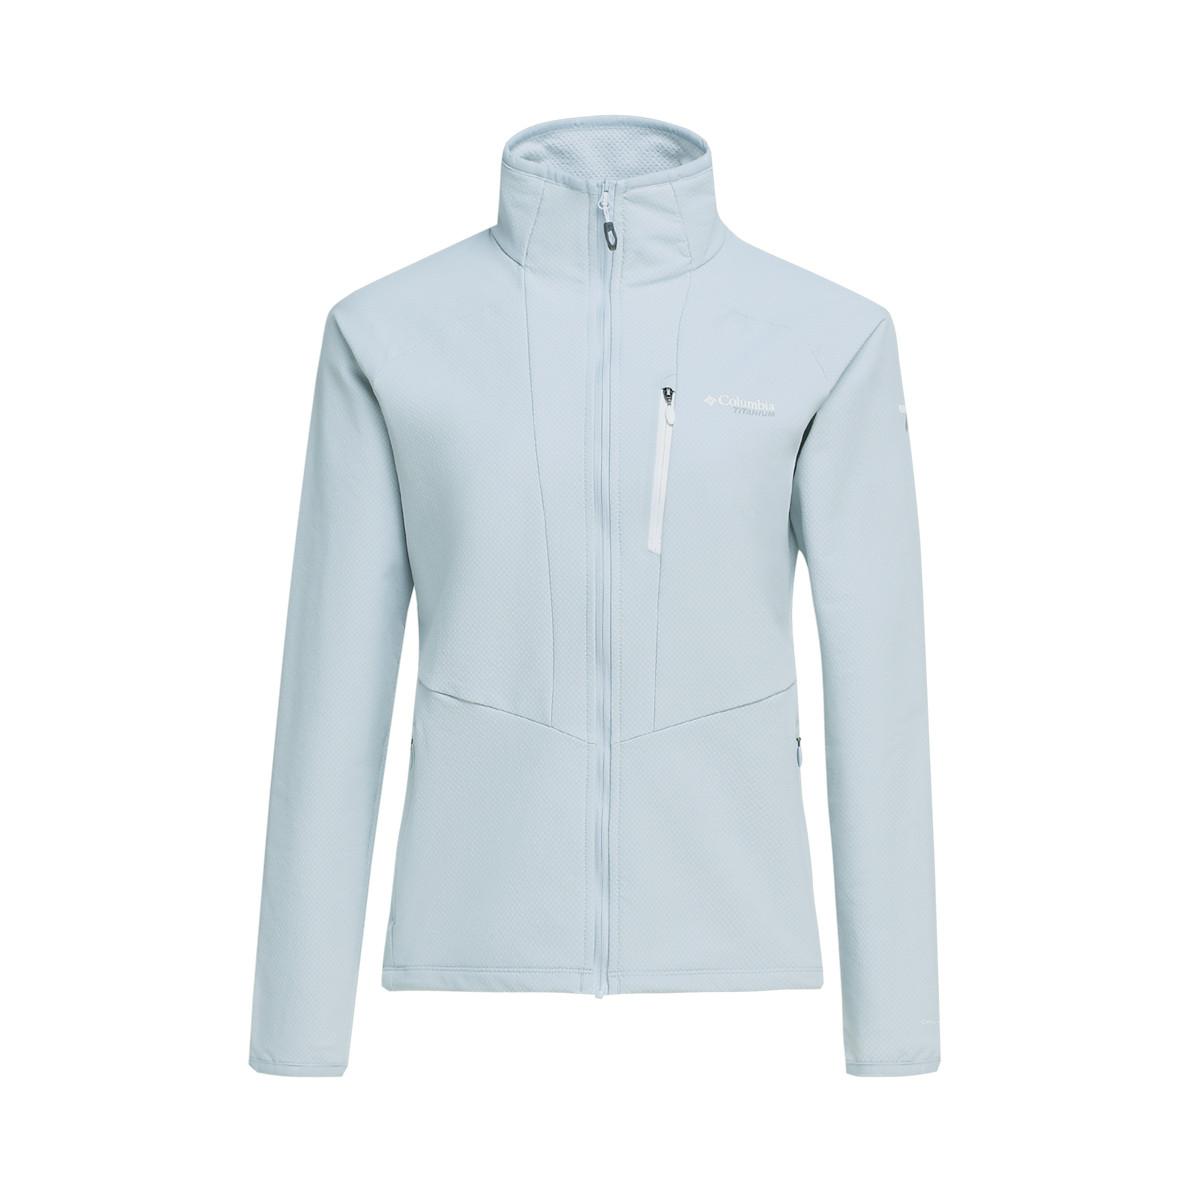 ColumbiaOMNI-SHIELD技术 女款长袖立领软壳外套1836863031